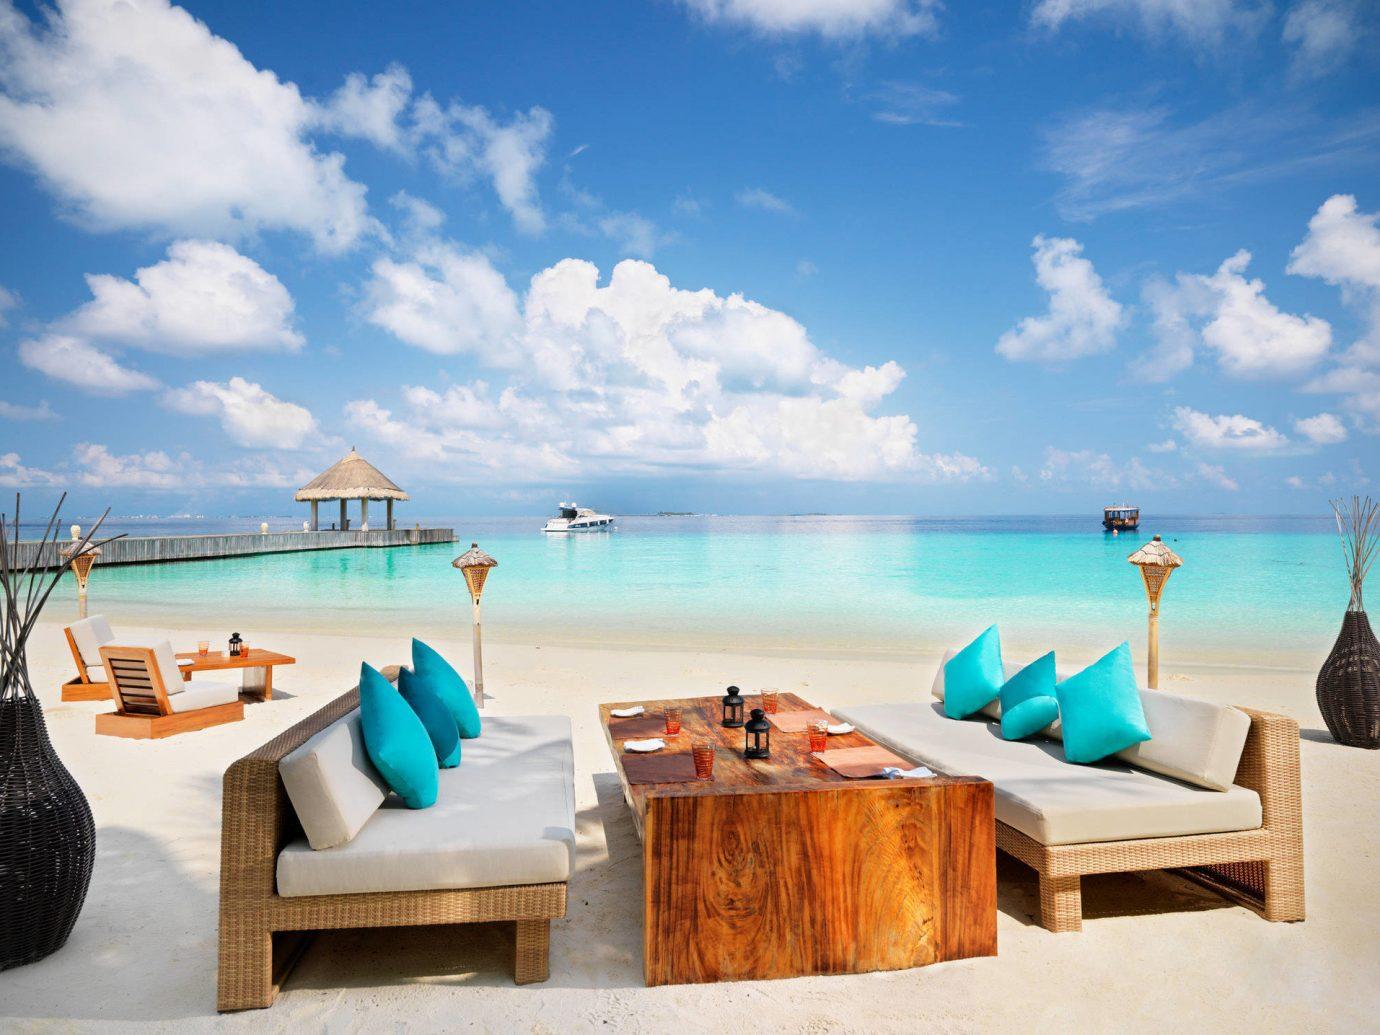 Romance Trip Ideas sky leisure Sea vacation caribbean Ocean Beach swimming pool Resort bay estate Coast Lagoon blue